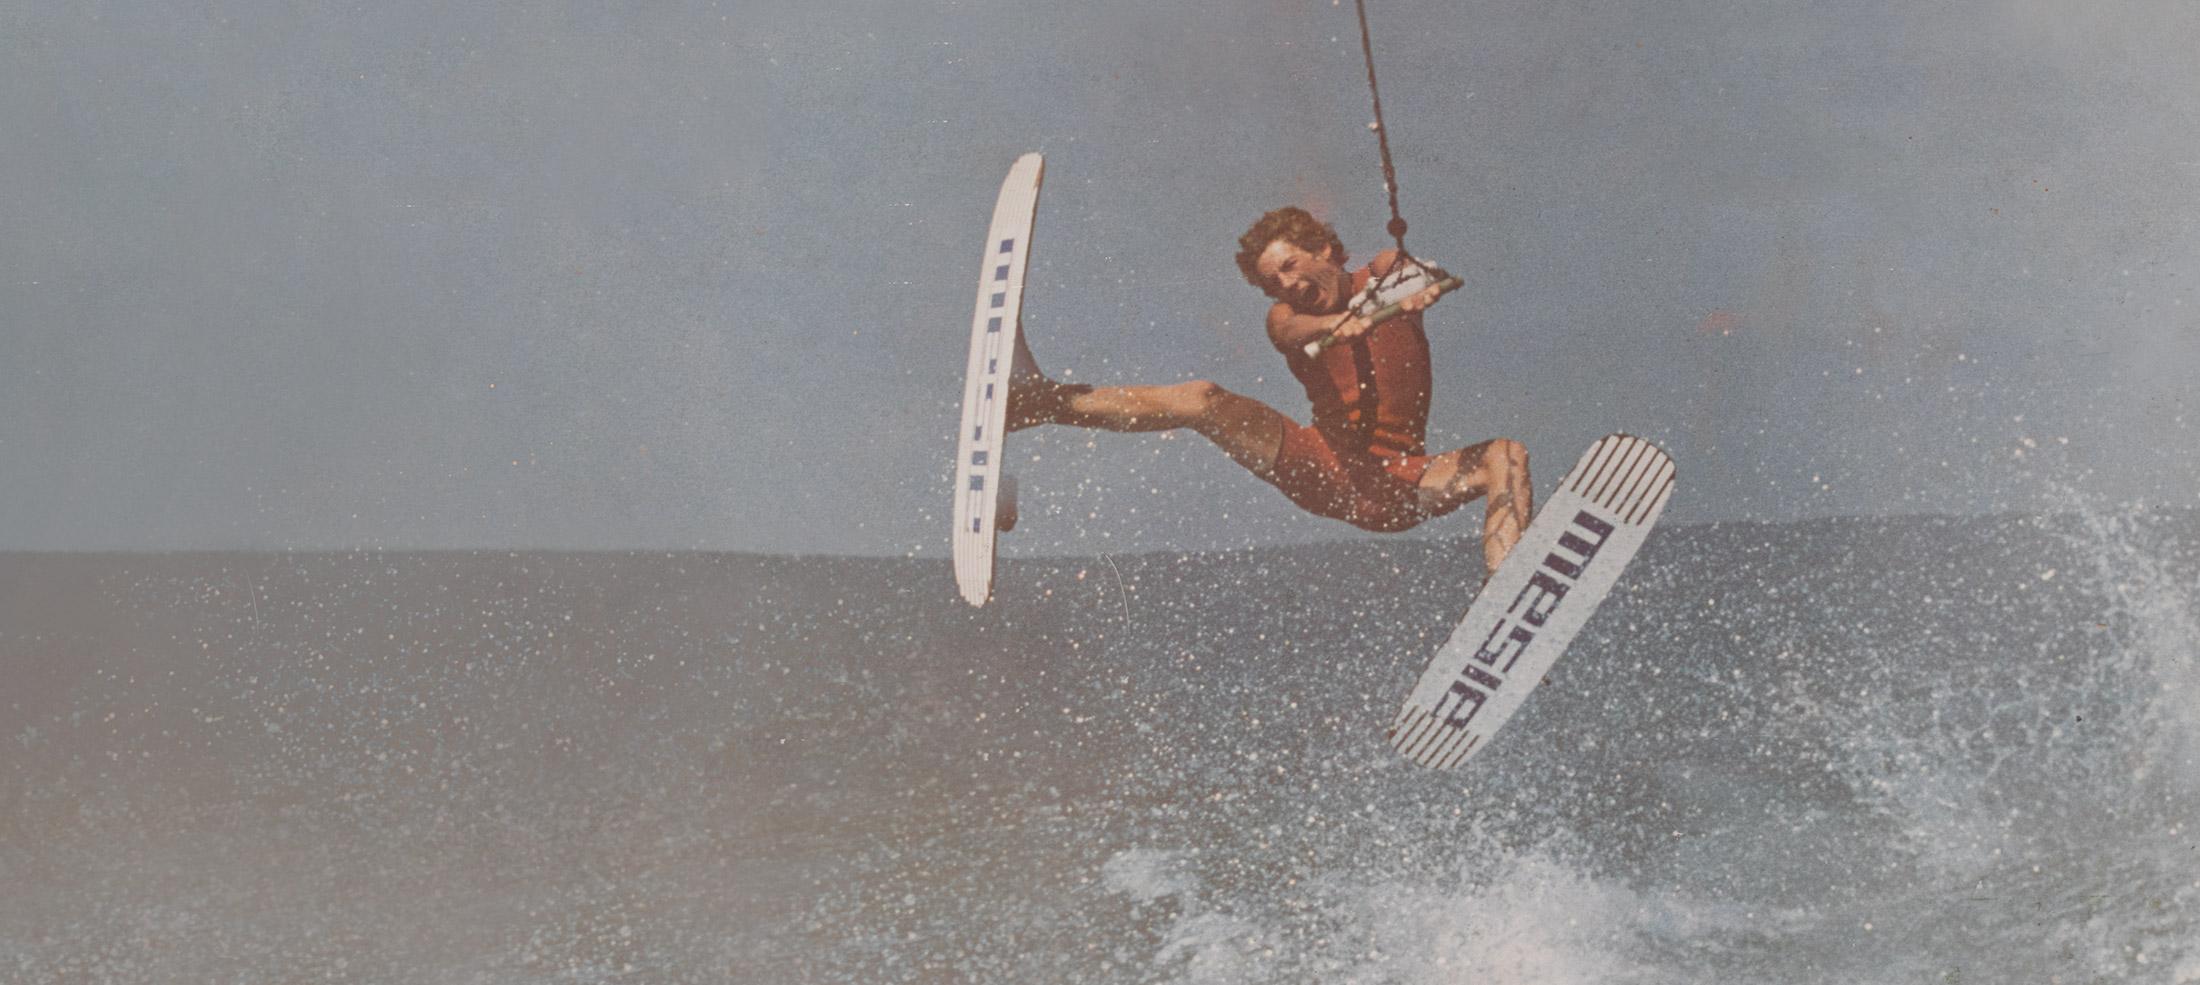 Mesle Ski